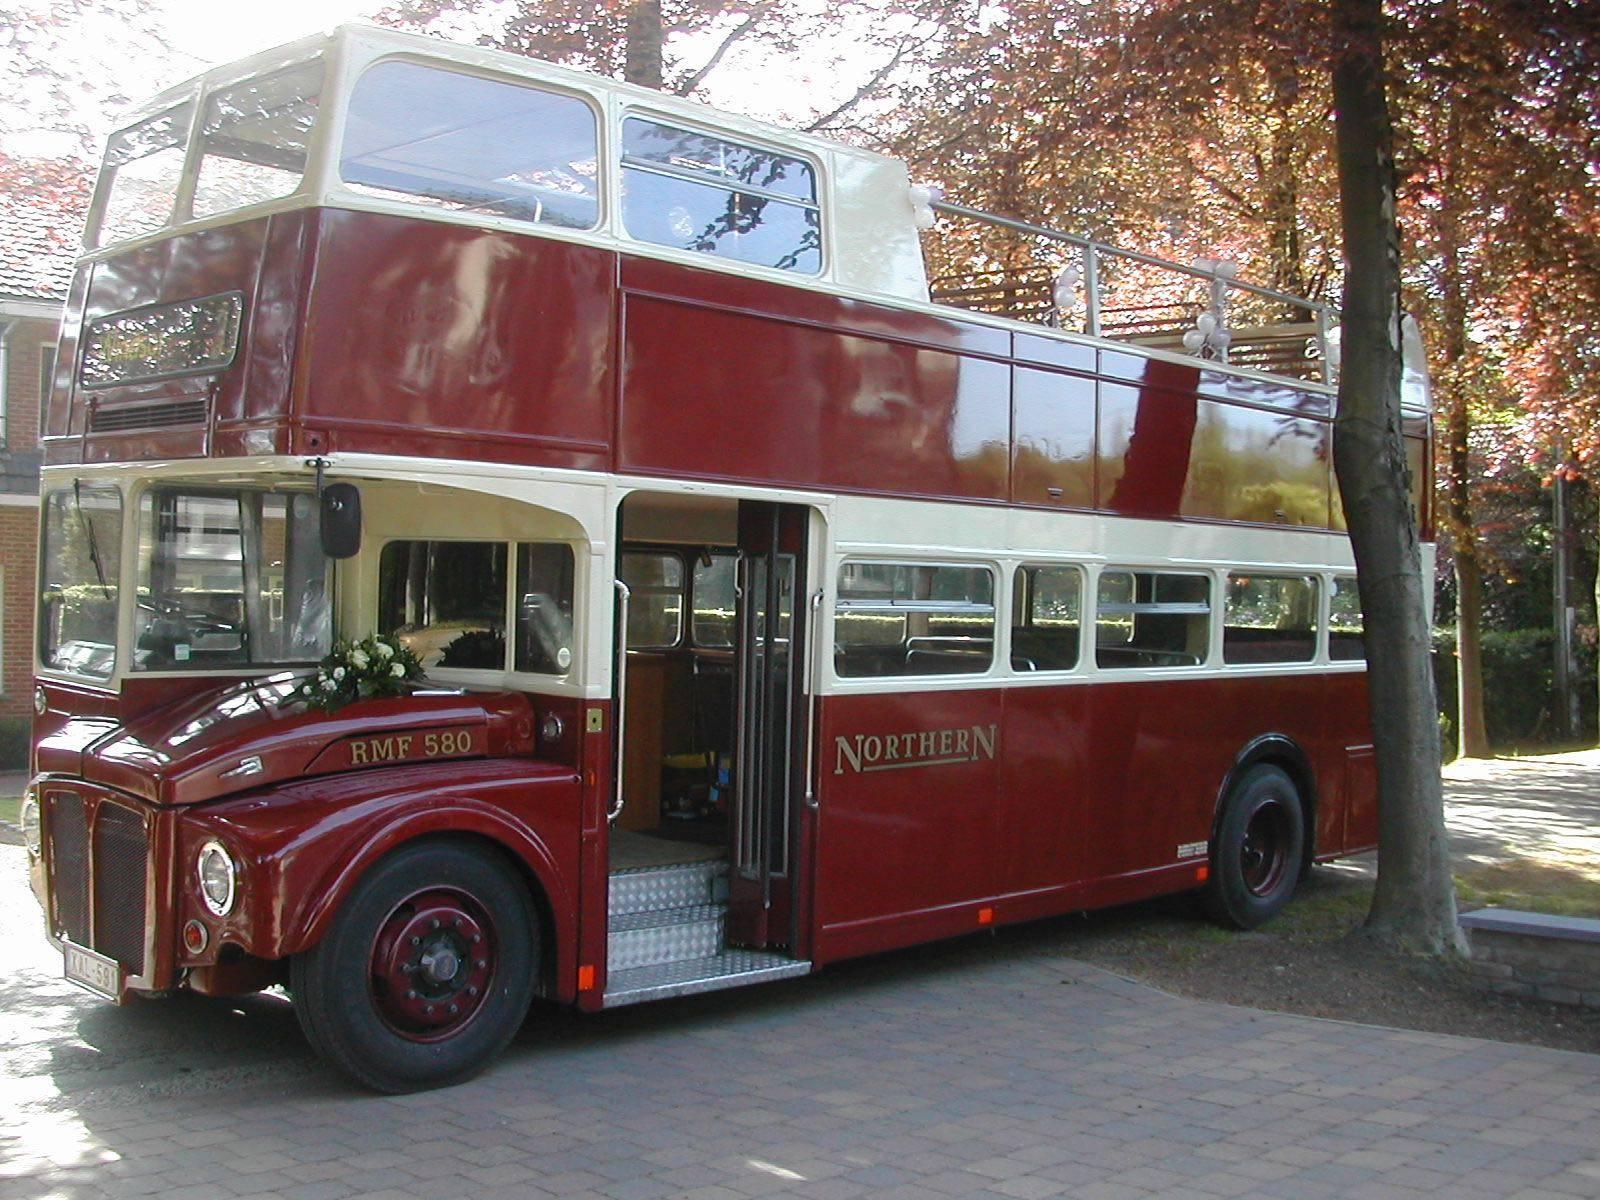 The London Ceremony Bus - Trouwvervoer - Ceremonievervoer - Bus - House of Weddings - 25